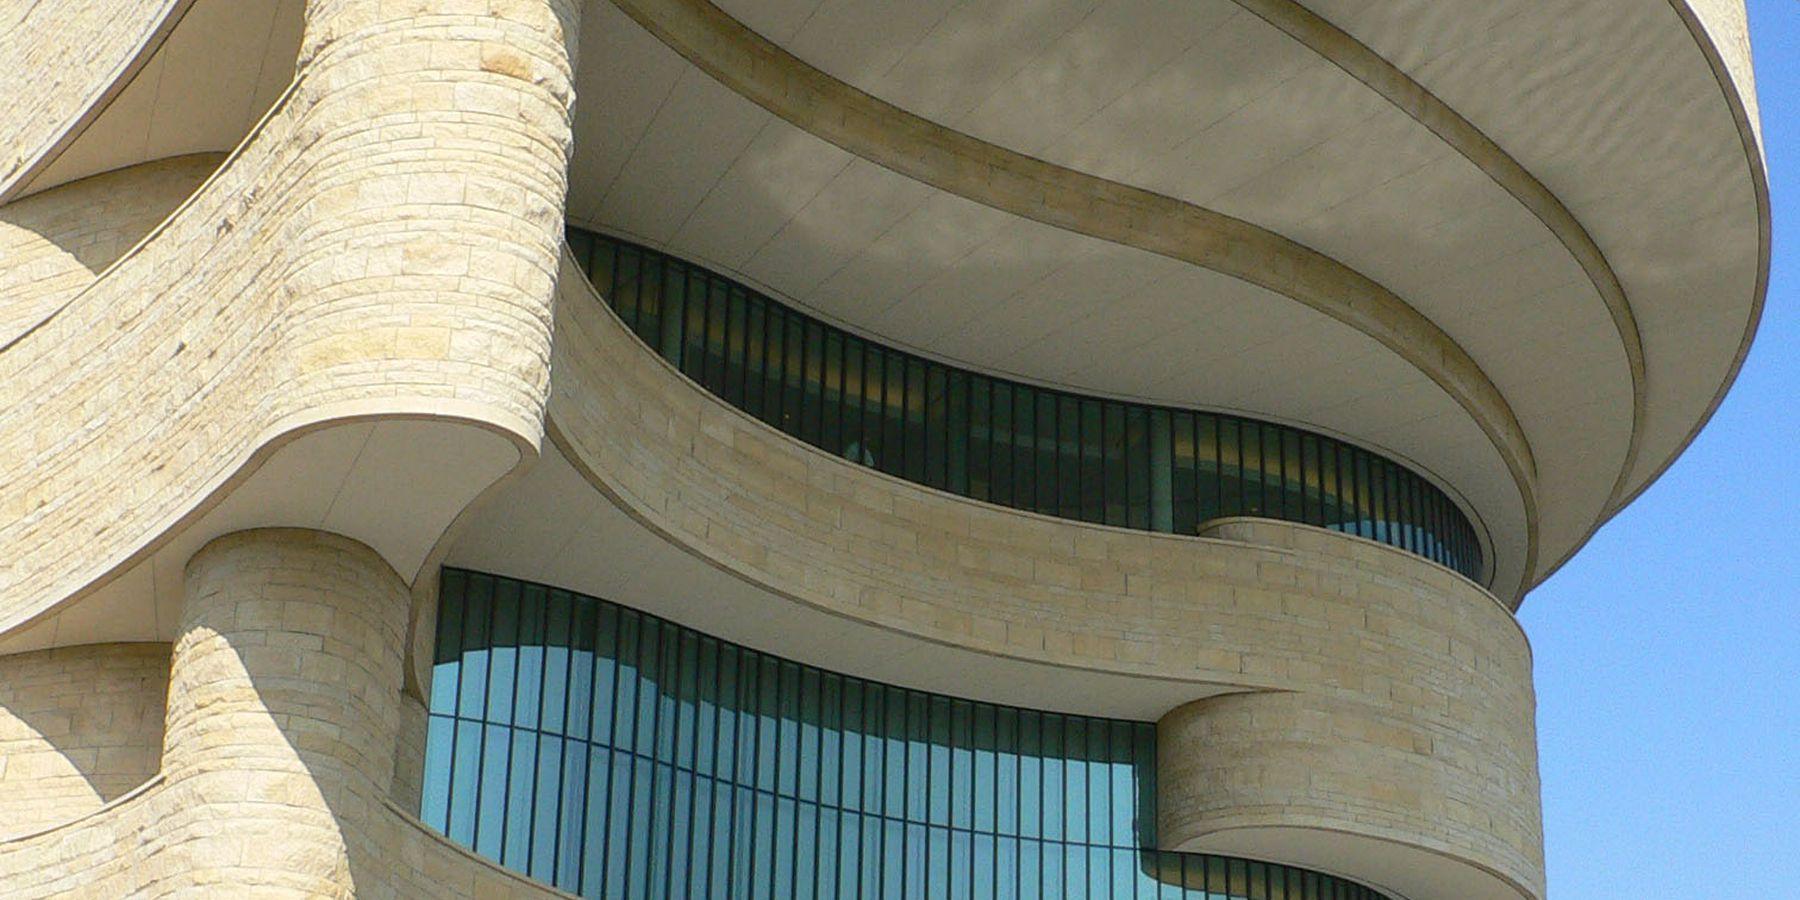 National Museum of the American Indian - Washington D.C. - Doets Reizen